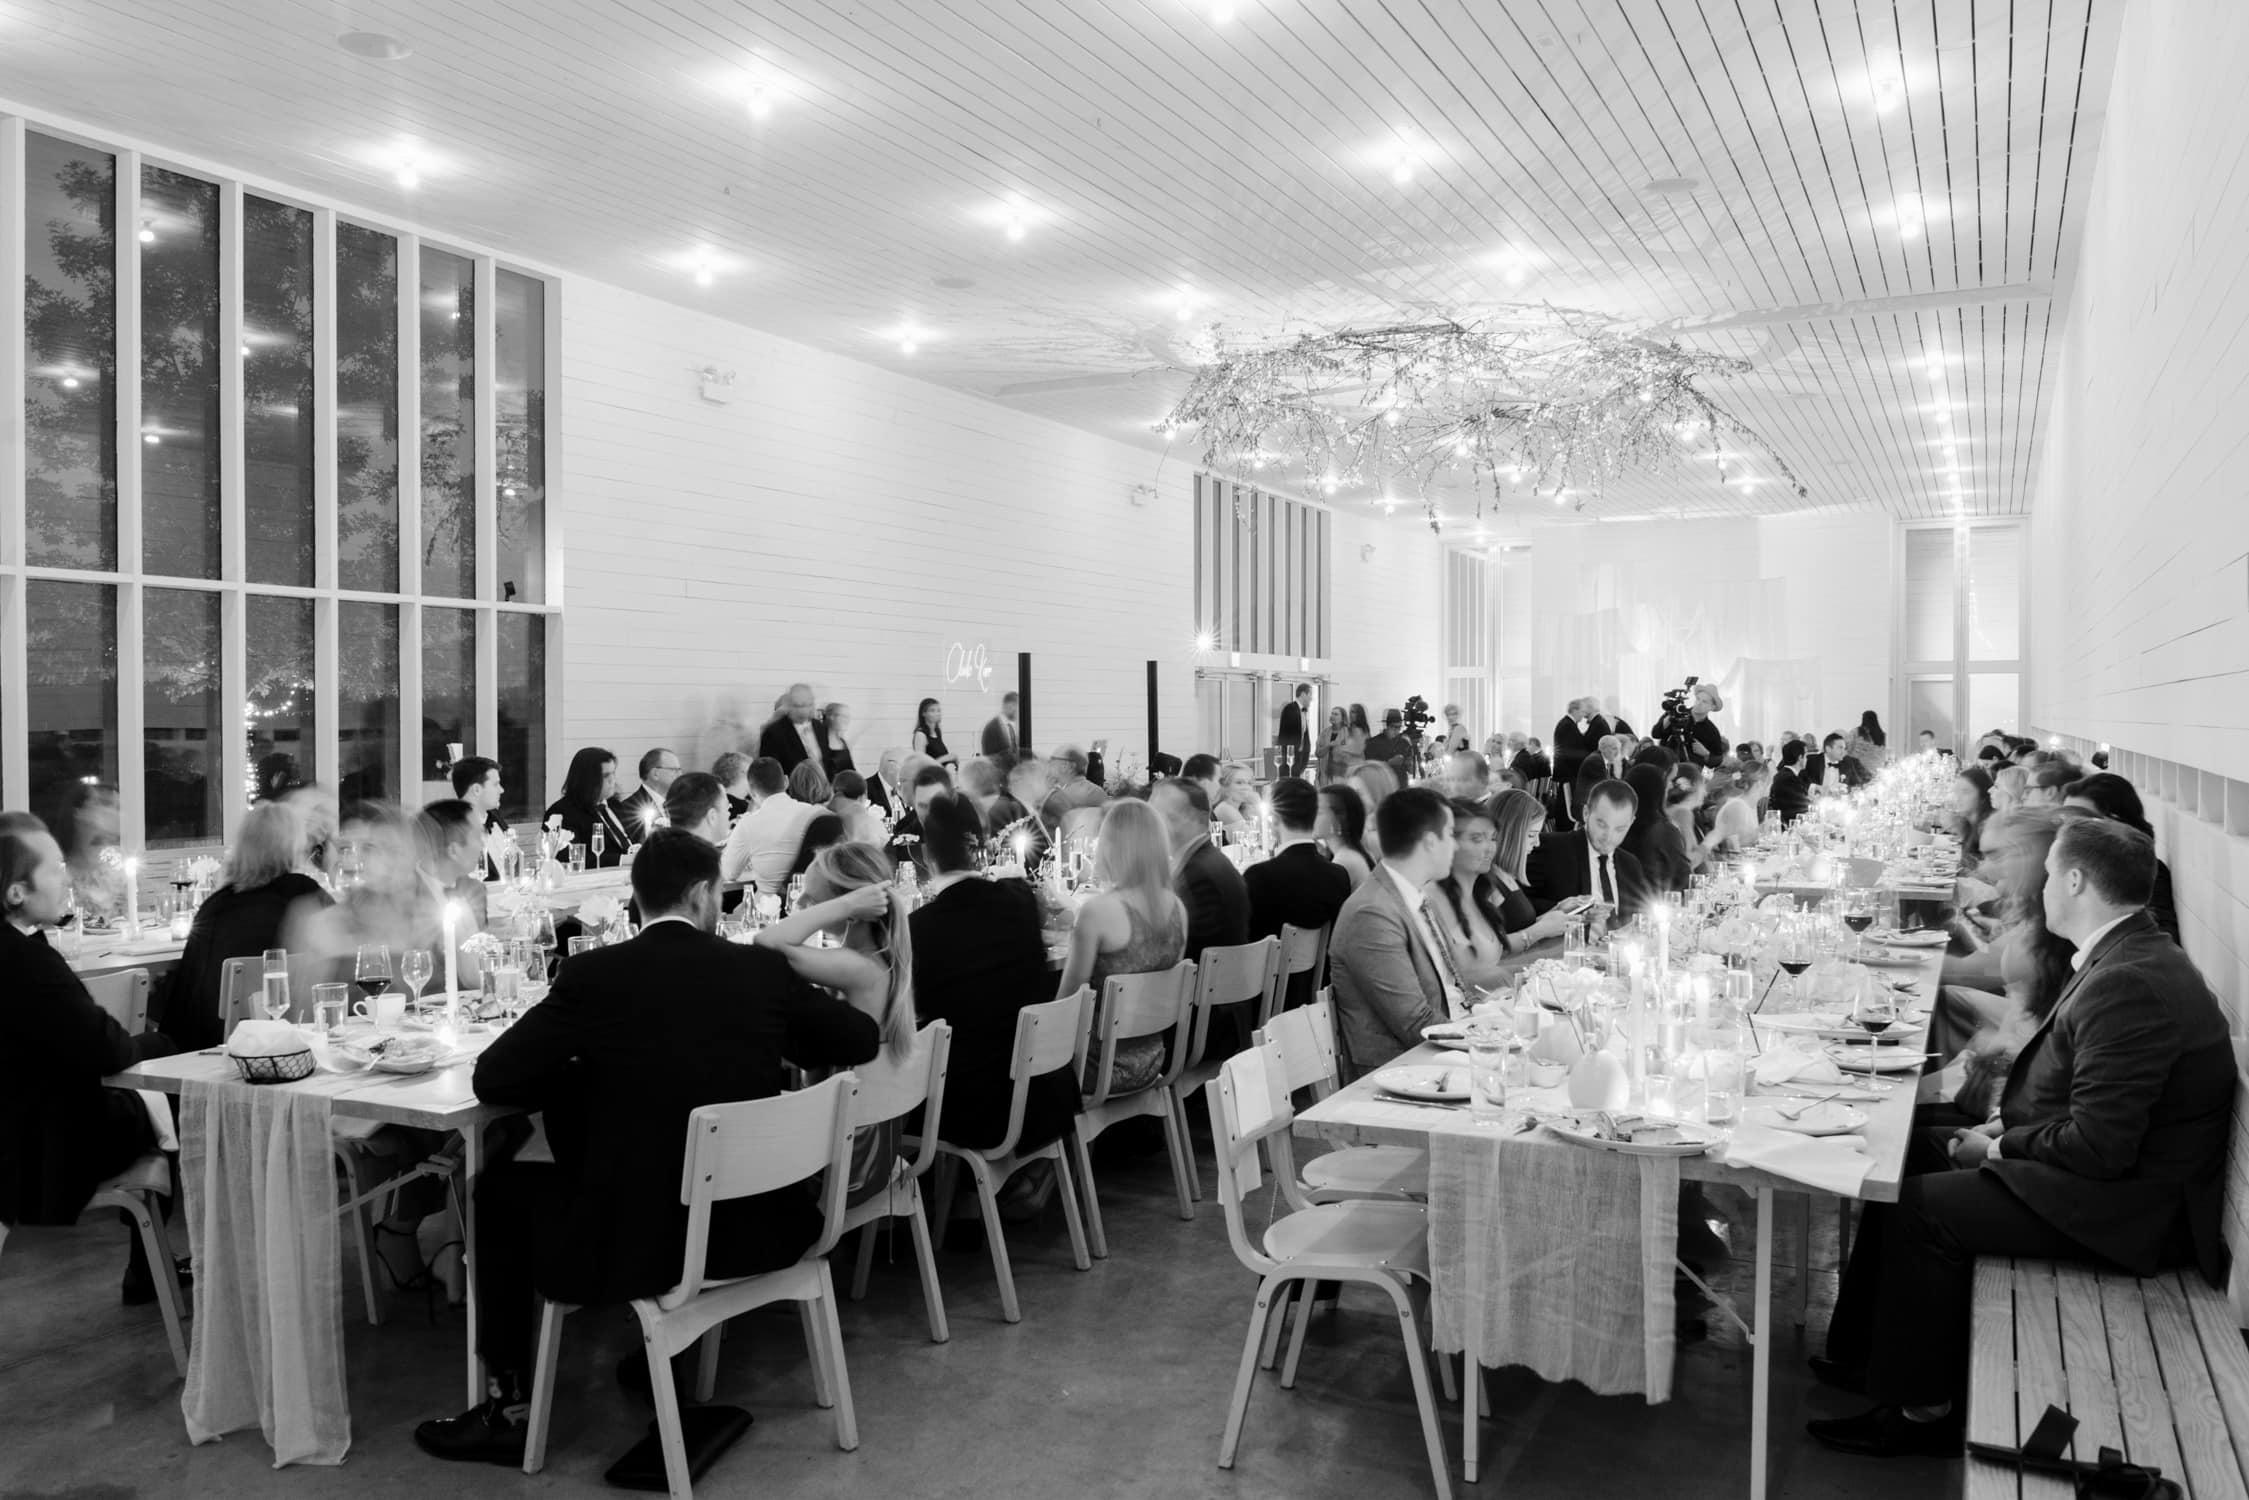 prospect-house-wedding-64.jpg